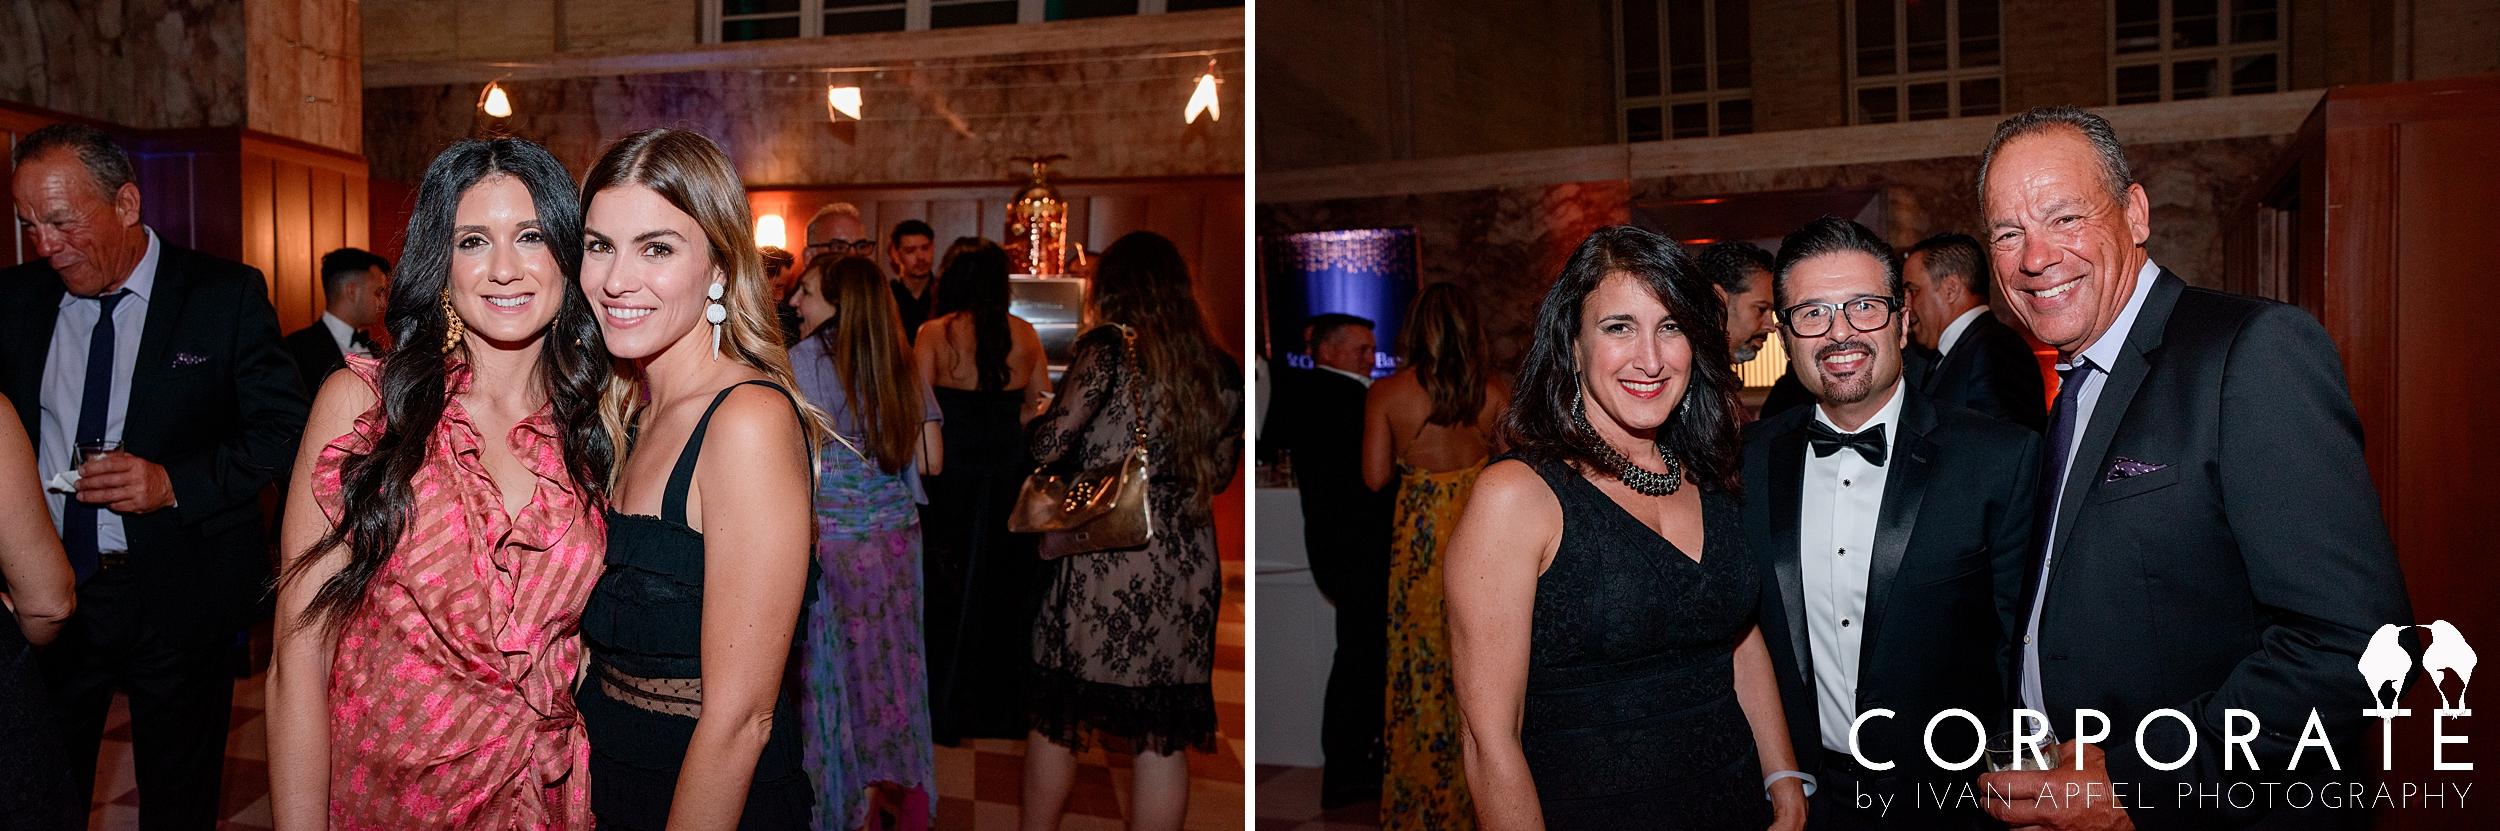 Miami Corporate Event Photographer Non-Profit Blue Missions Gala_0015.jpg